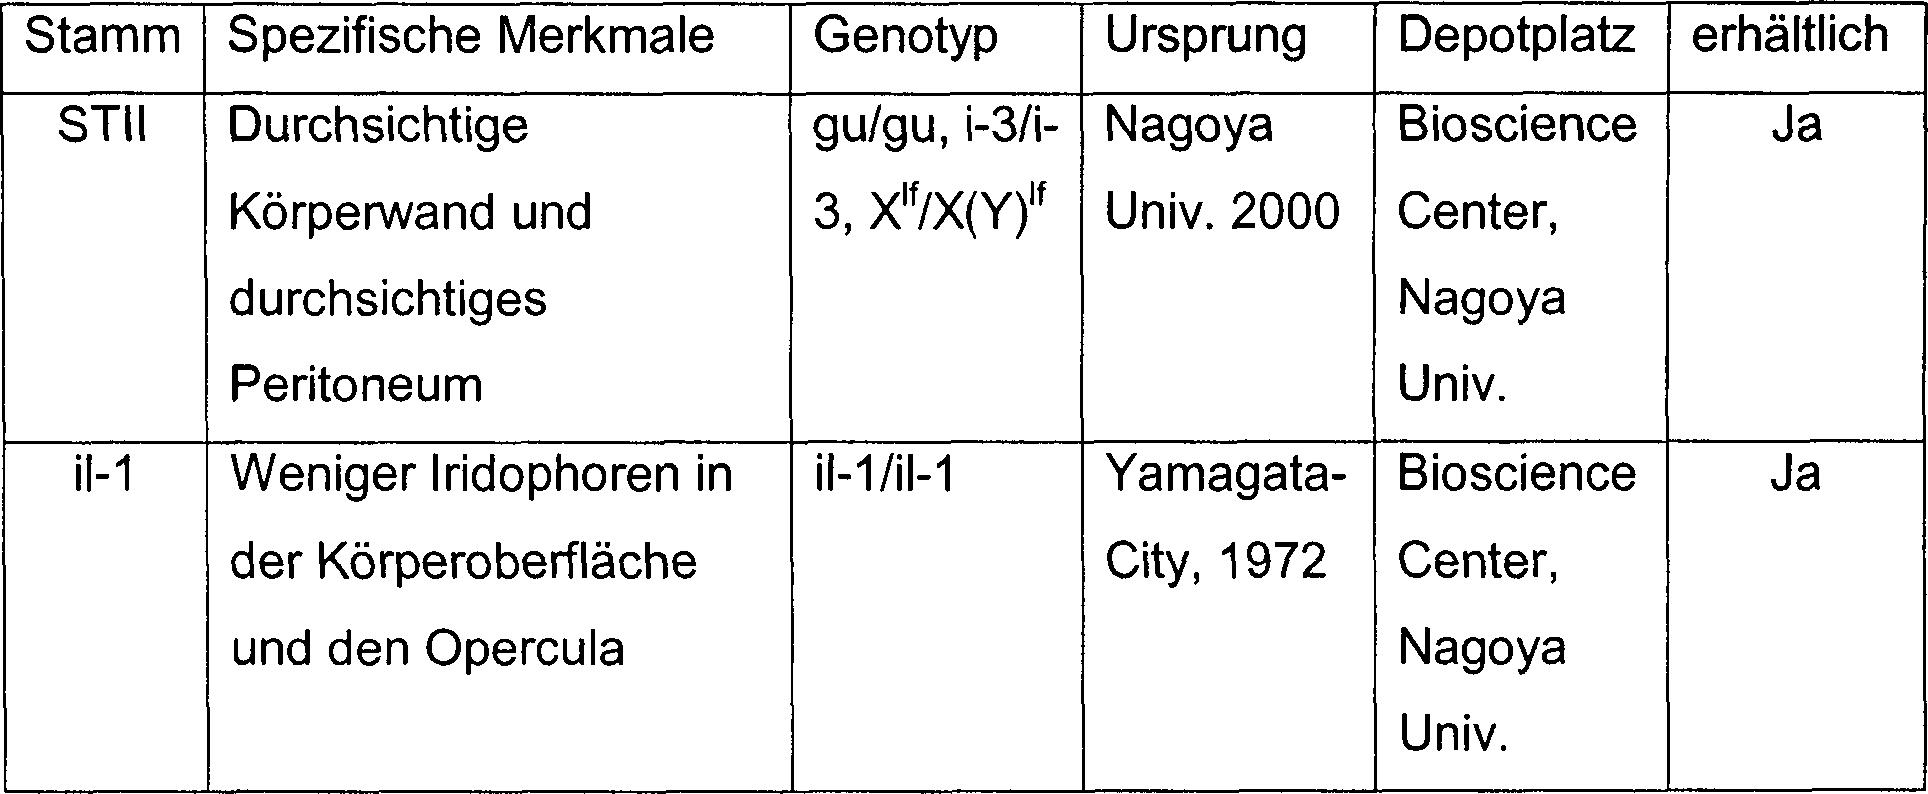 Charmant Kontext Anhaltspunkte Einer Tabelle 5Klasse Galerie - Super ...